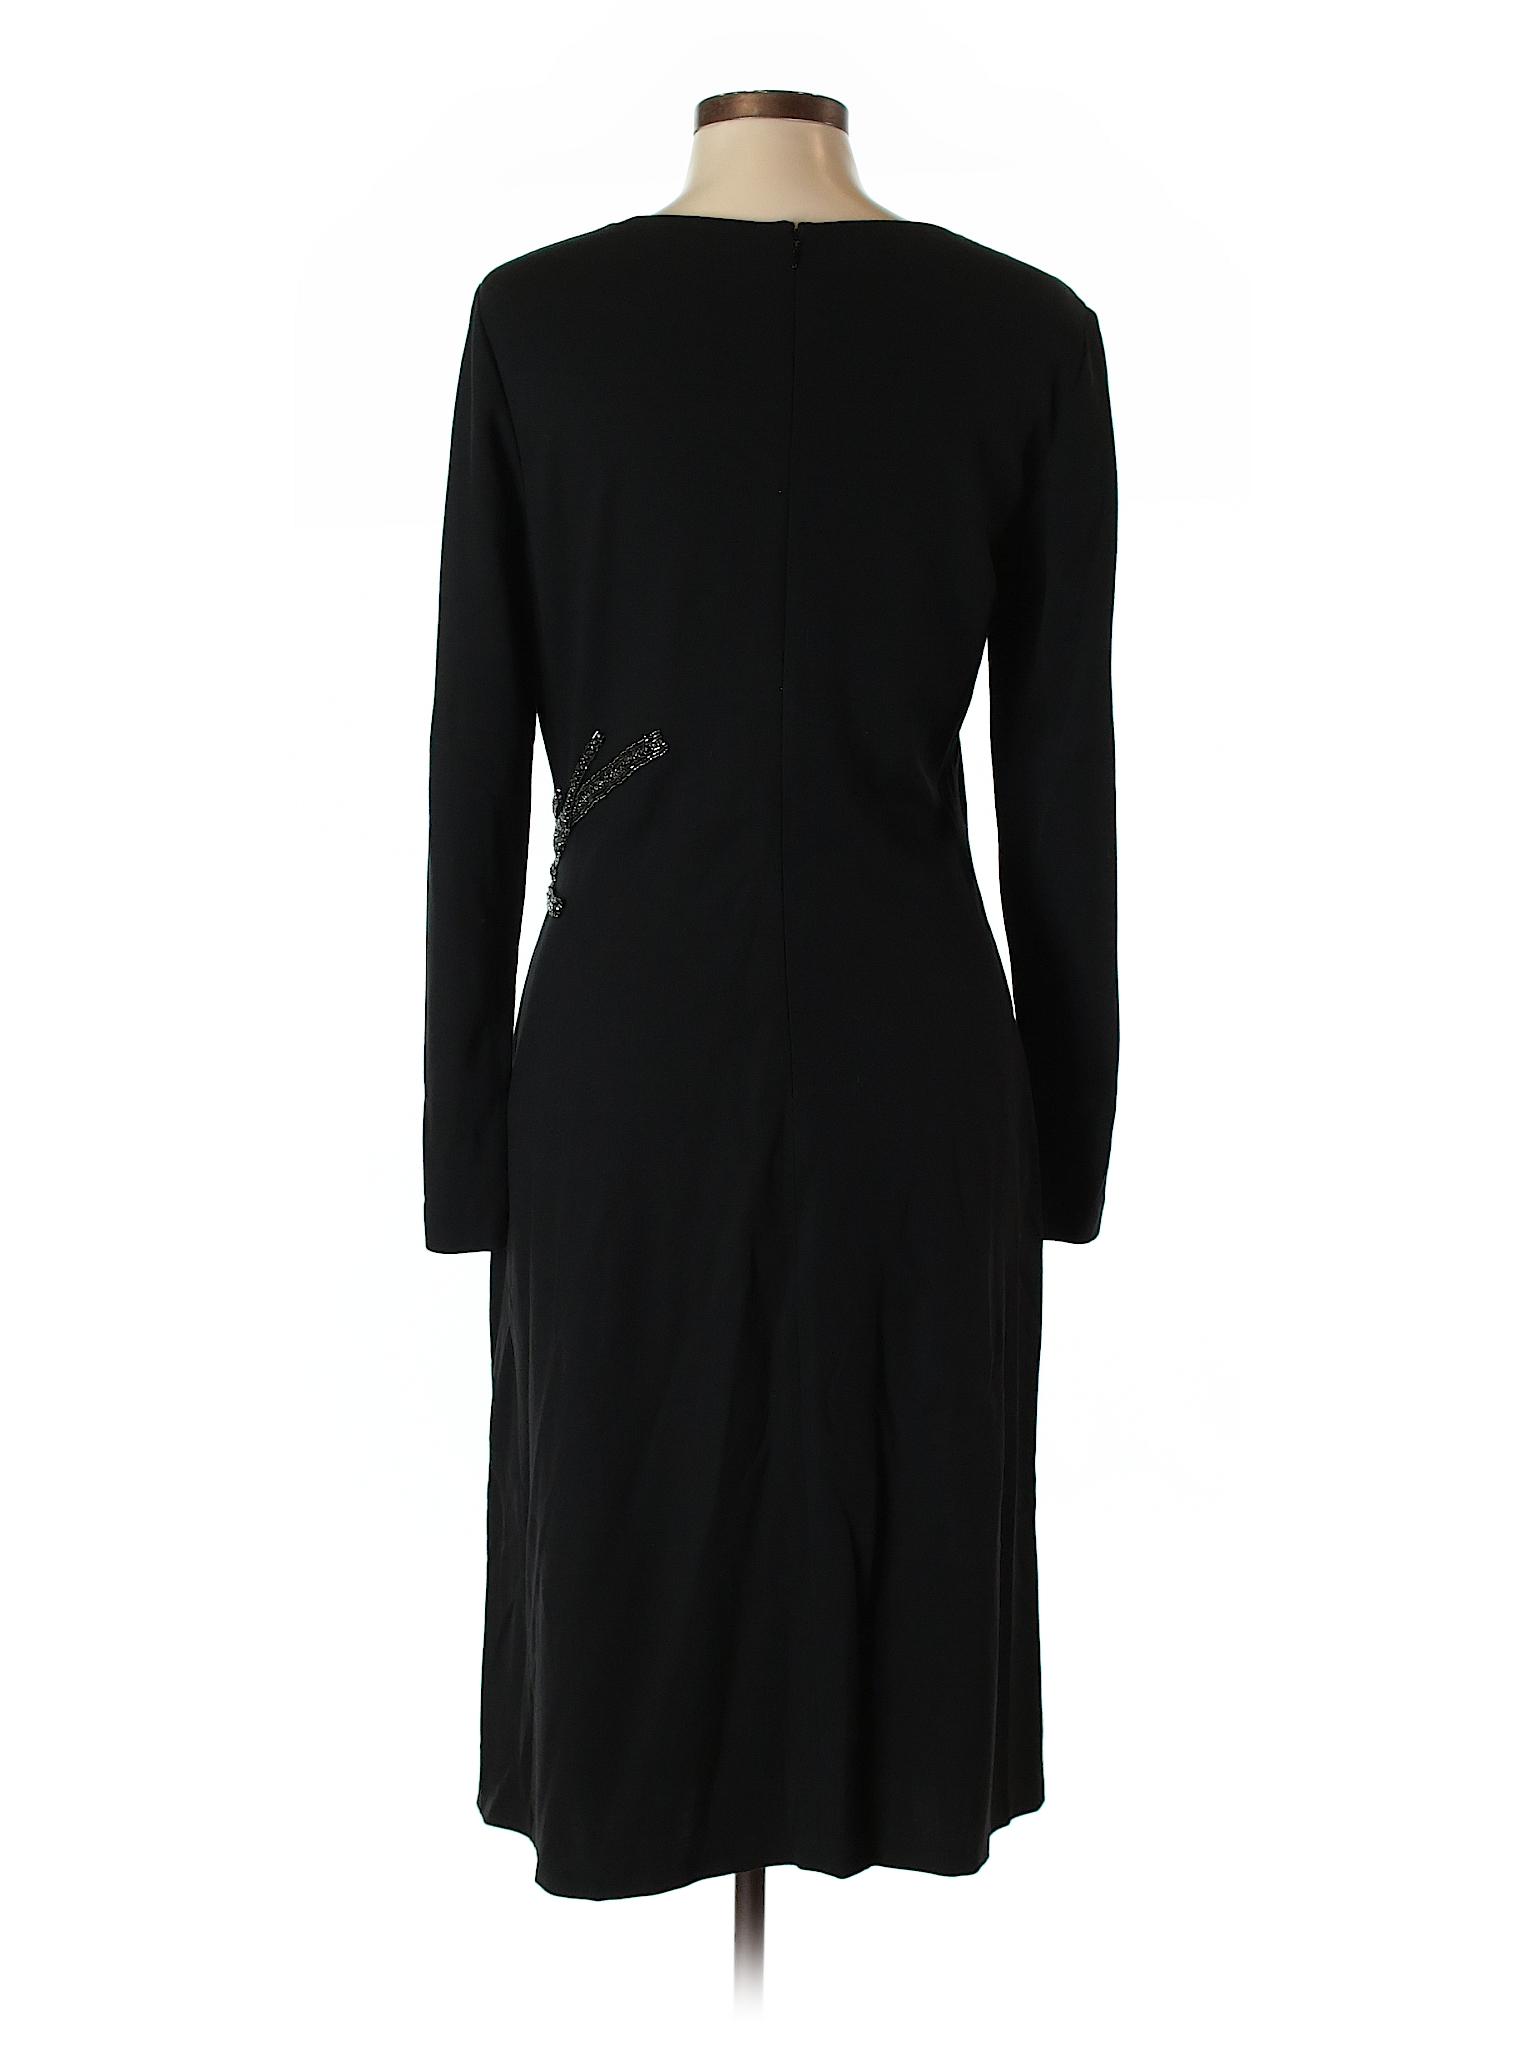 Boutique New Dress 148 winter Lafayette Casual York UZZOx7f